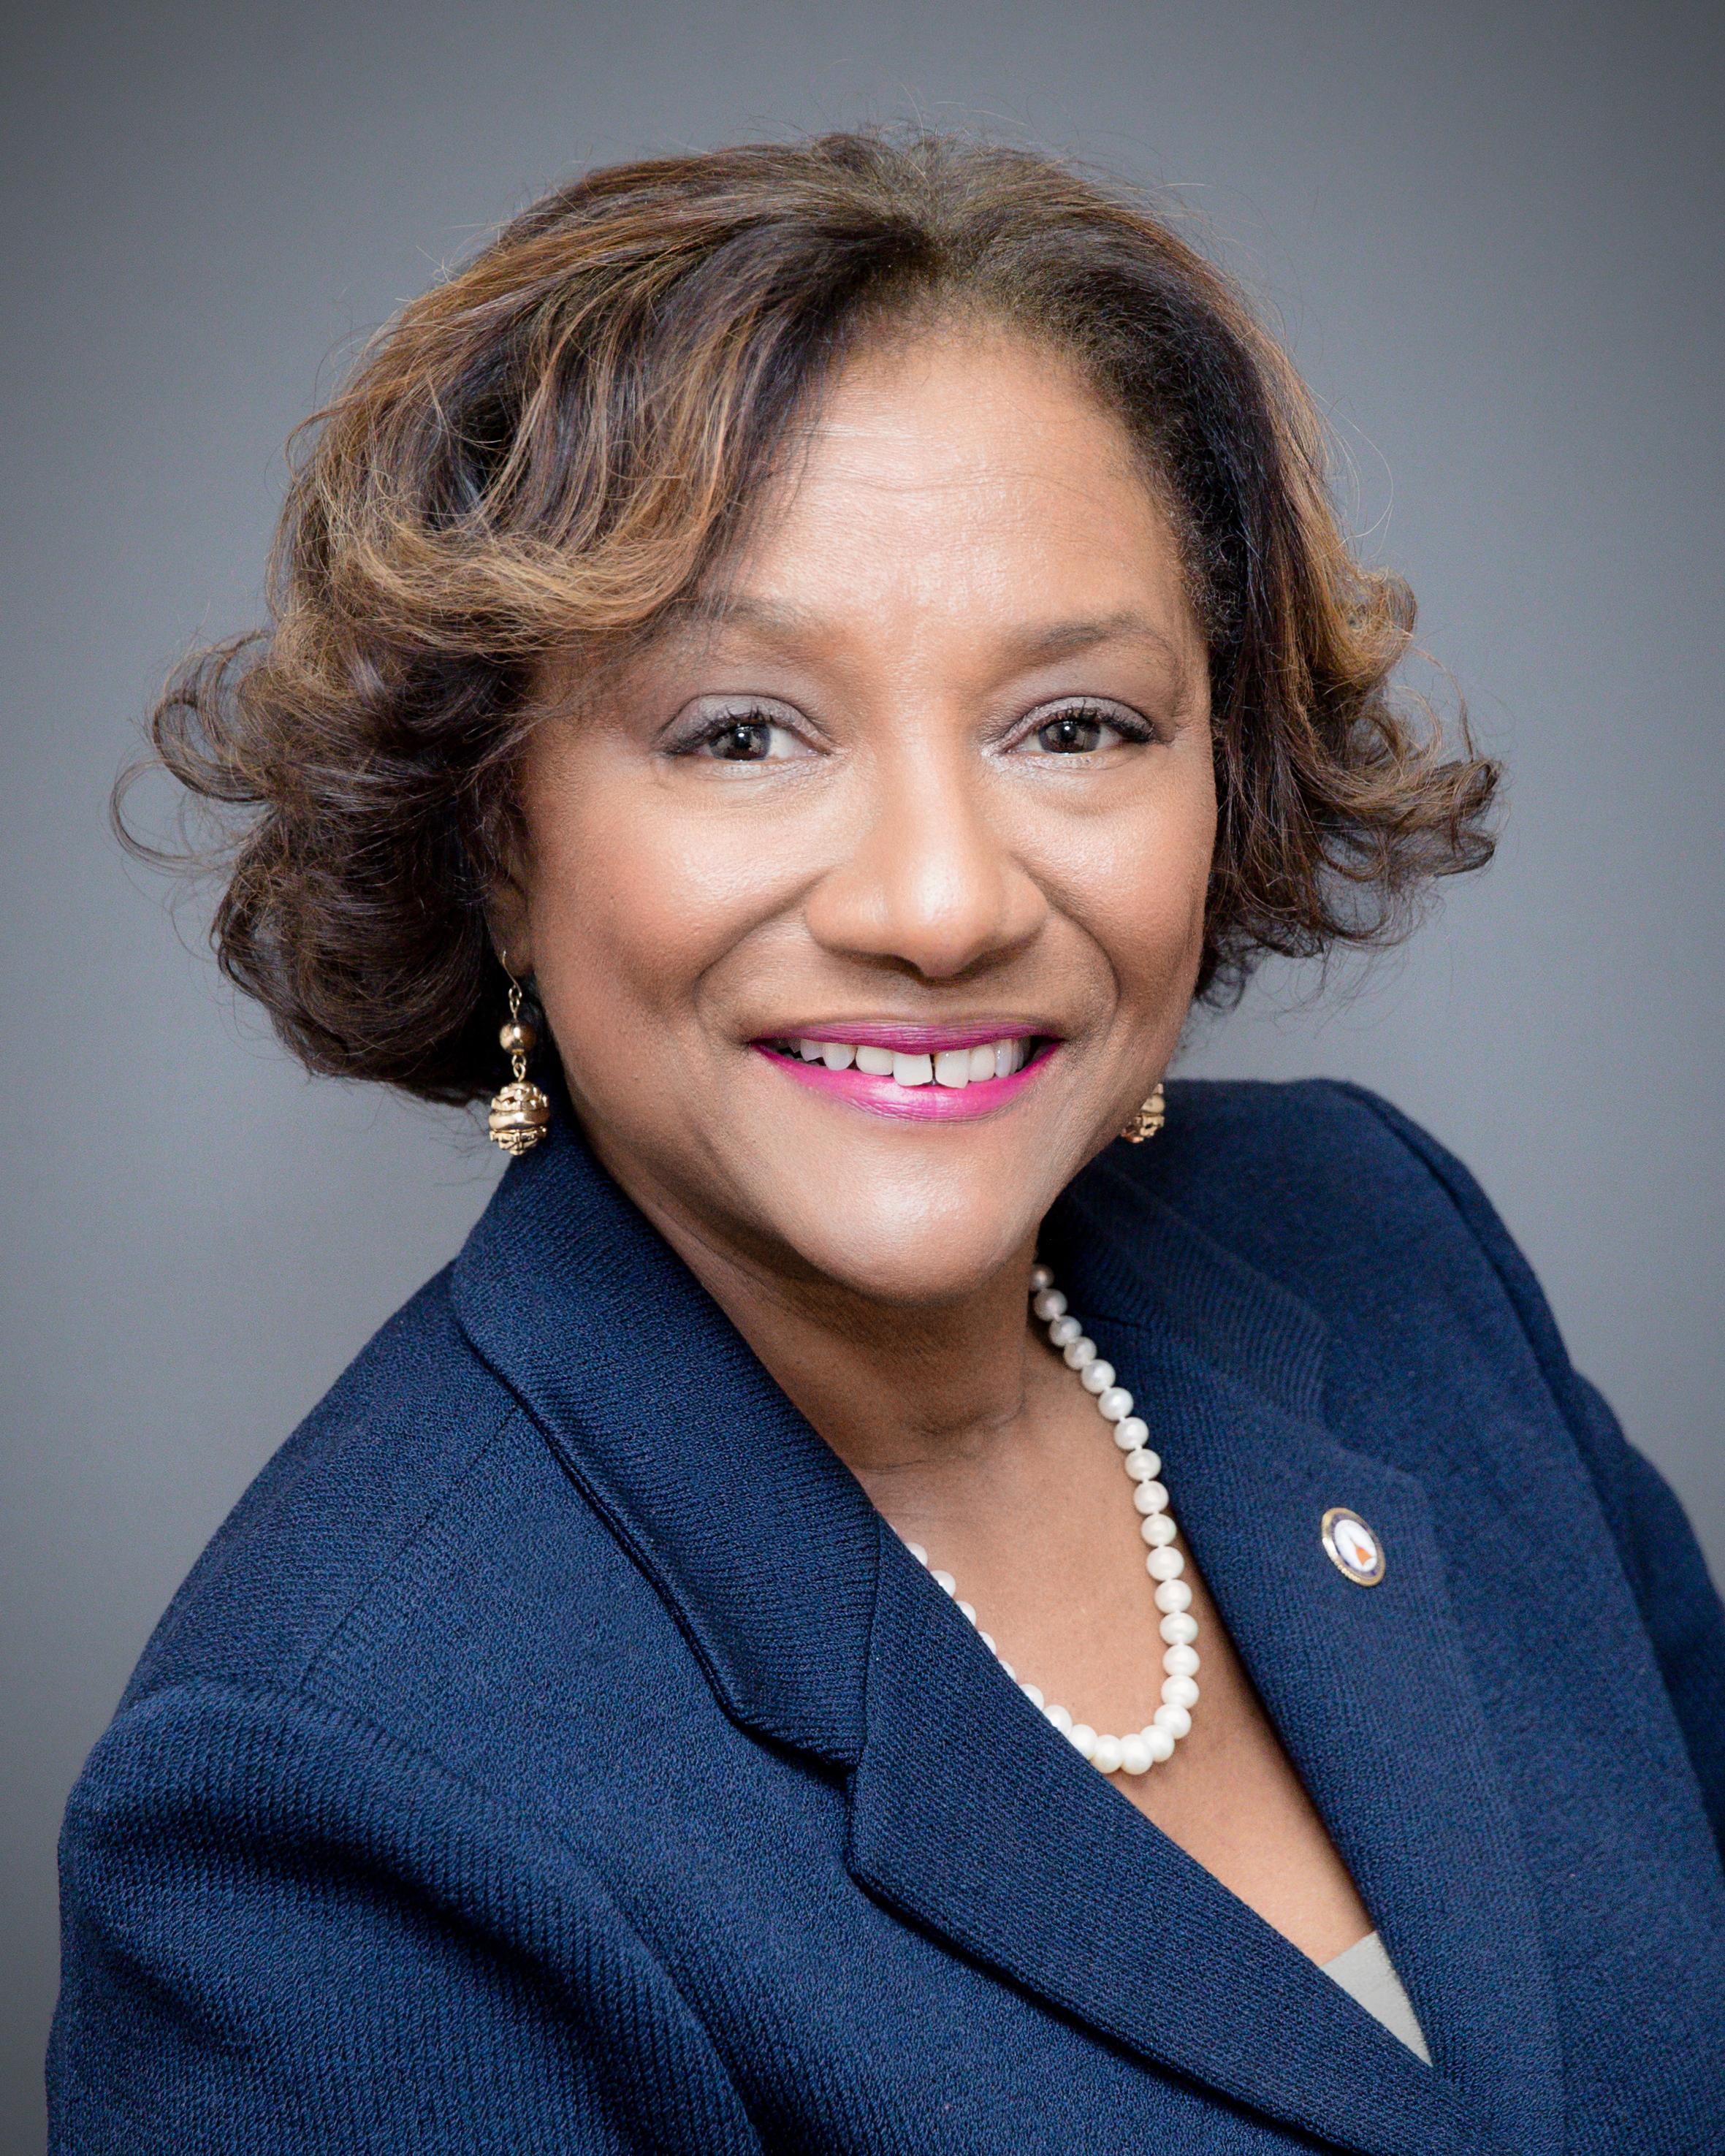 State Representative Karen Bennett, Chairman